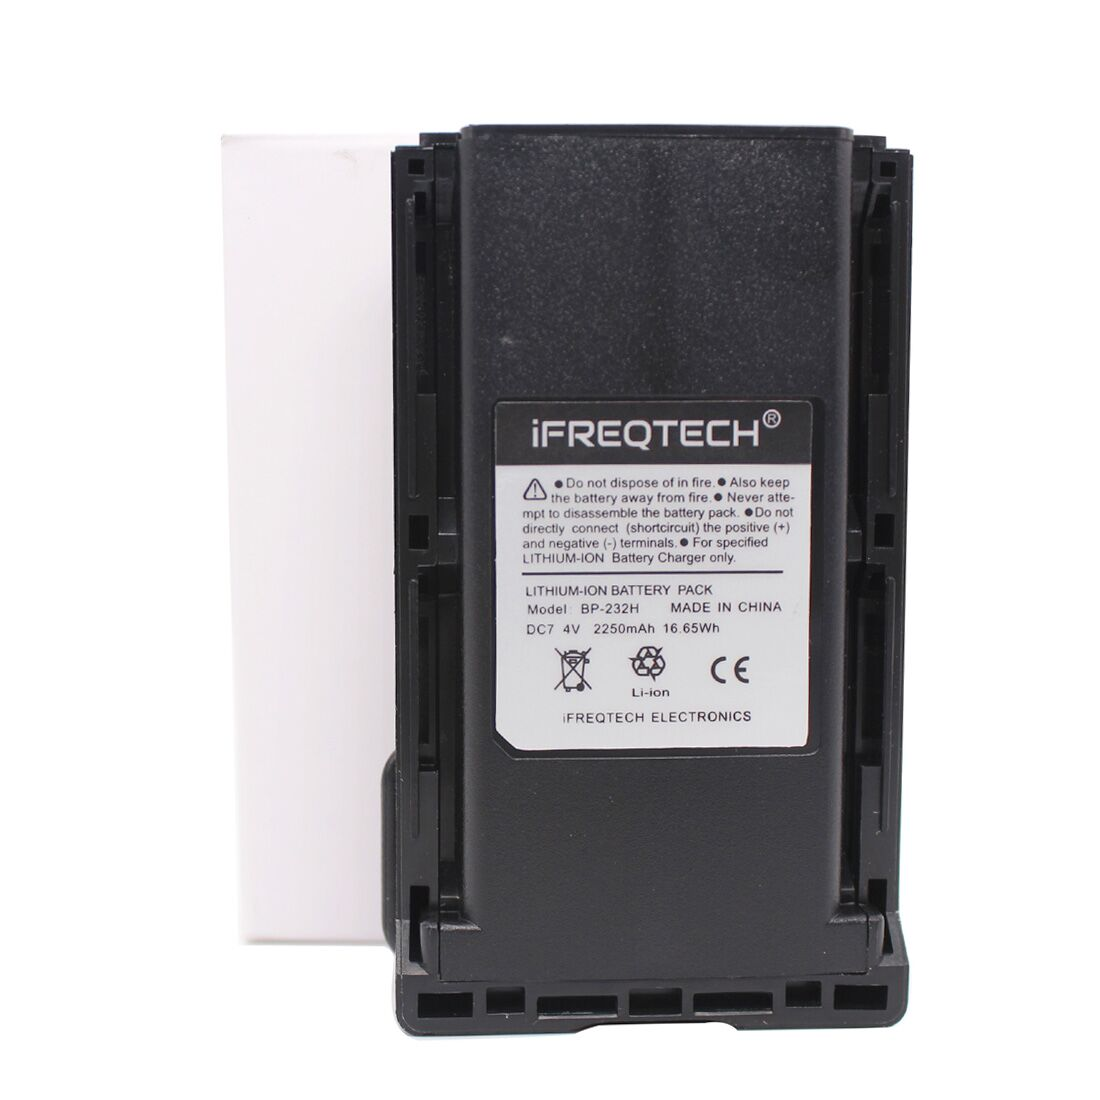 Аккумулятор для радиоприемника Icom, BP-232, 2250 мА/ч, BP-232H, A14, F14, F16, F24, F26, F33GS, F34G, IC-A14, F3011, IC-F4021, F4161DT/DS, T/S, F416